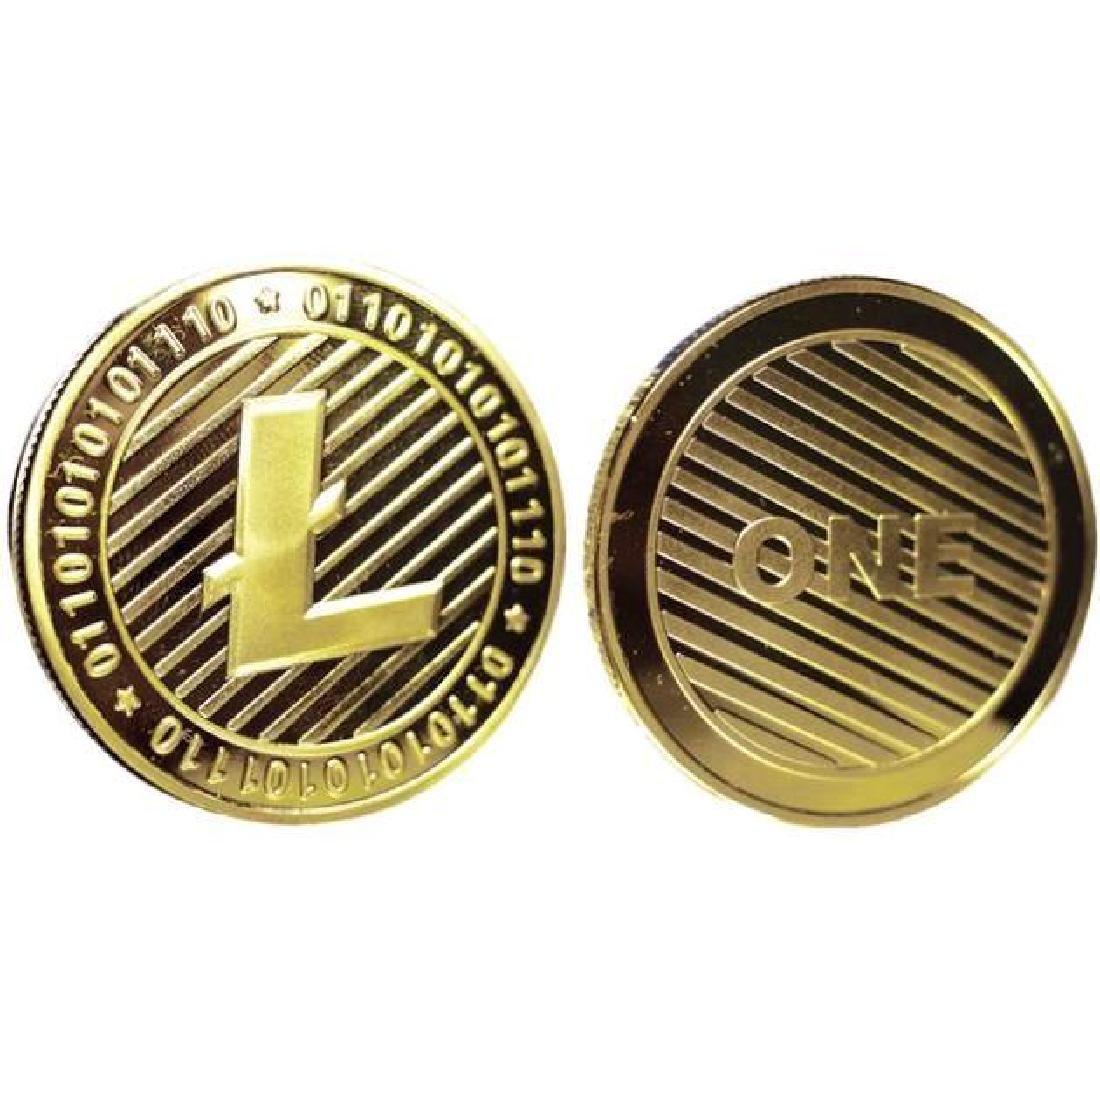 One Litecoin Gold Clad Crypto Coin